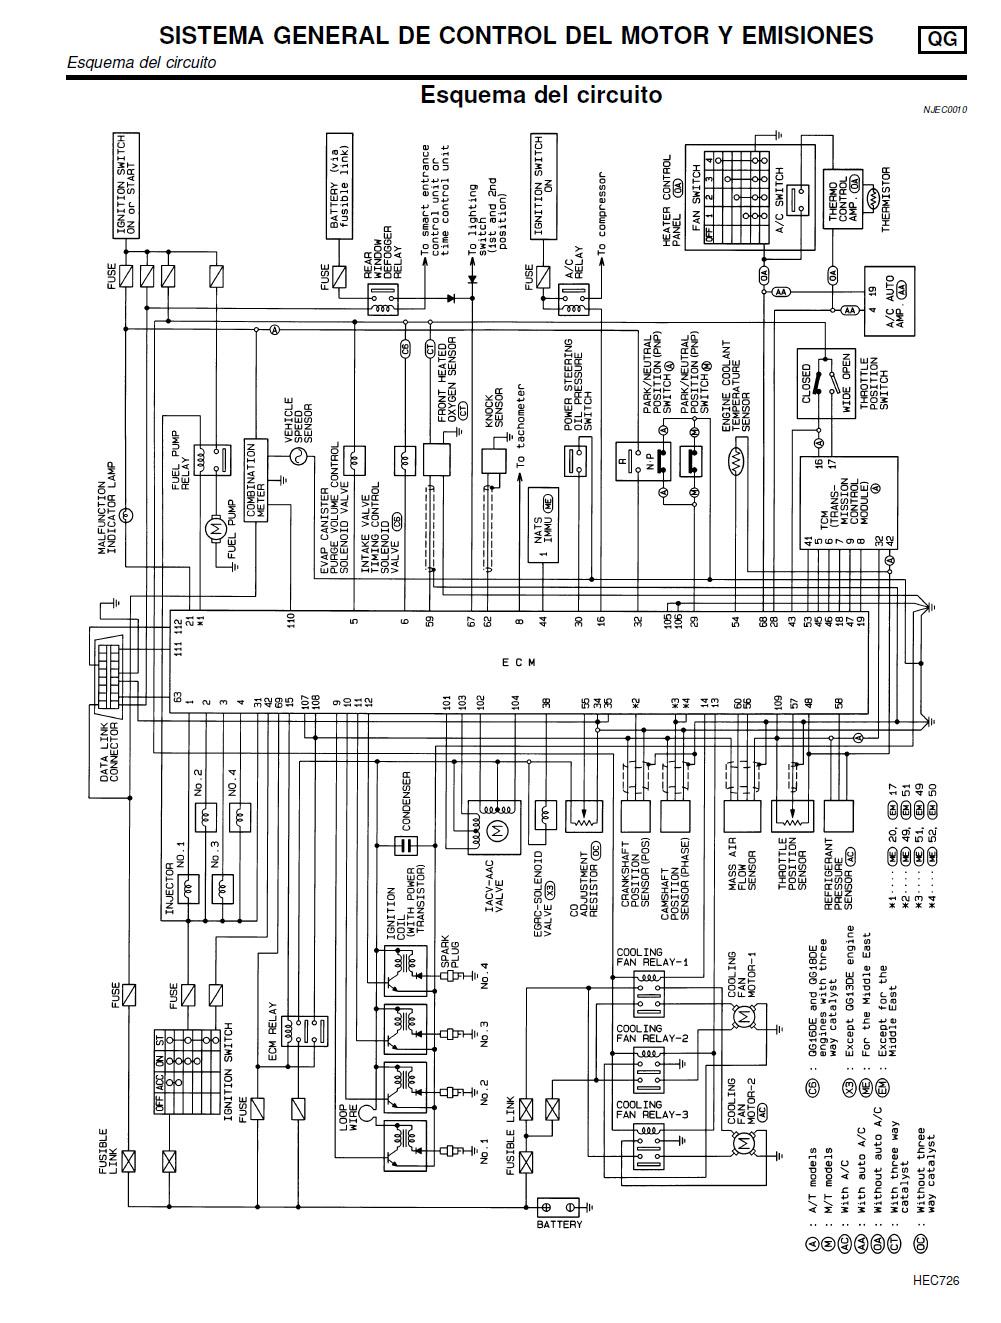 hight resolution of 2013 nissan sentra wiring diagram 2013 nissan sentra fuse nissan sentra engine diagram 91 nissan sentra stereo wiring diagram